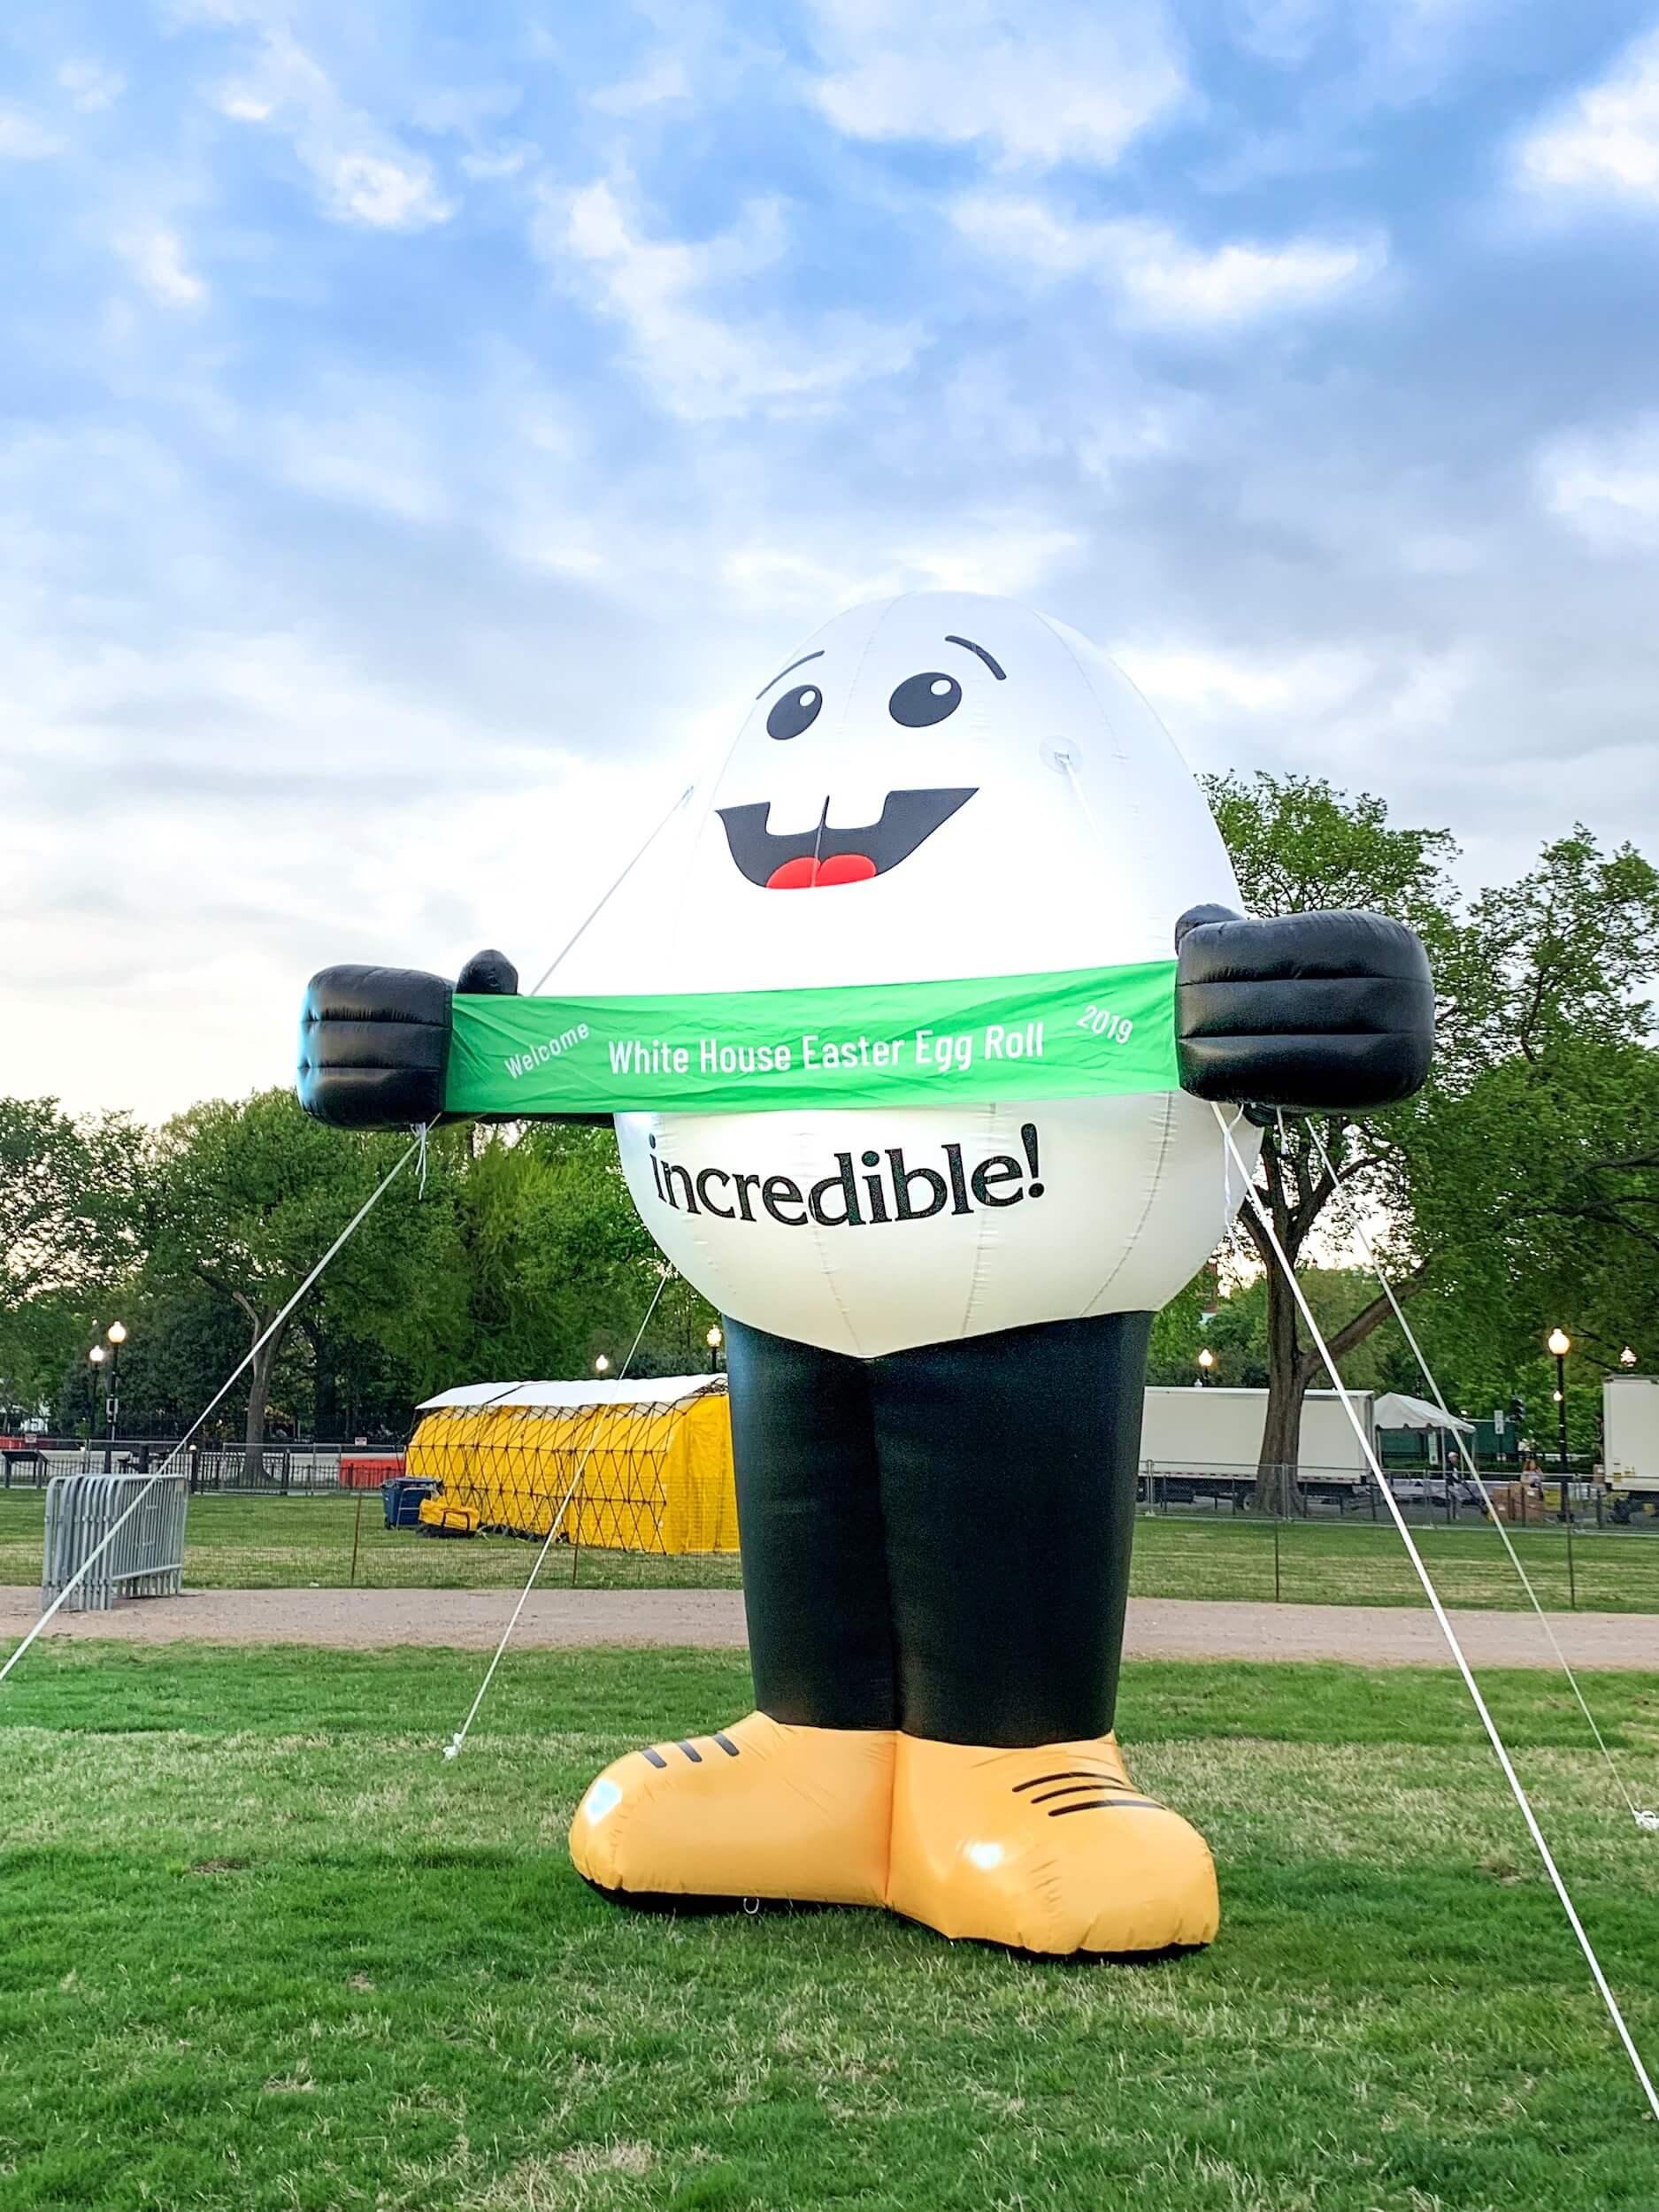 11-american-egg-board-inflatable-eggy-cold-air.jpg